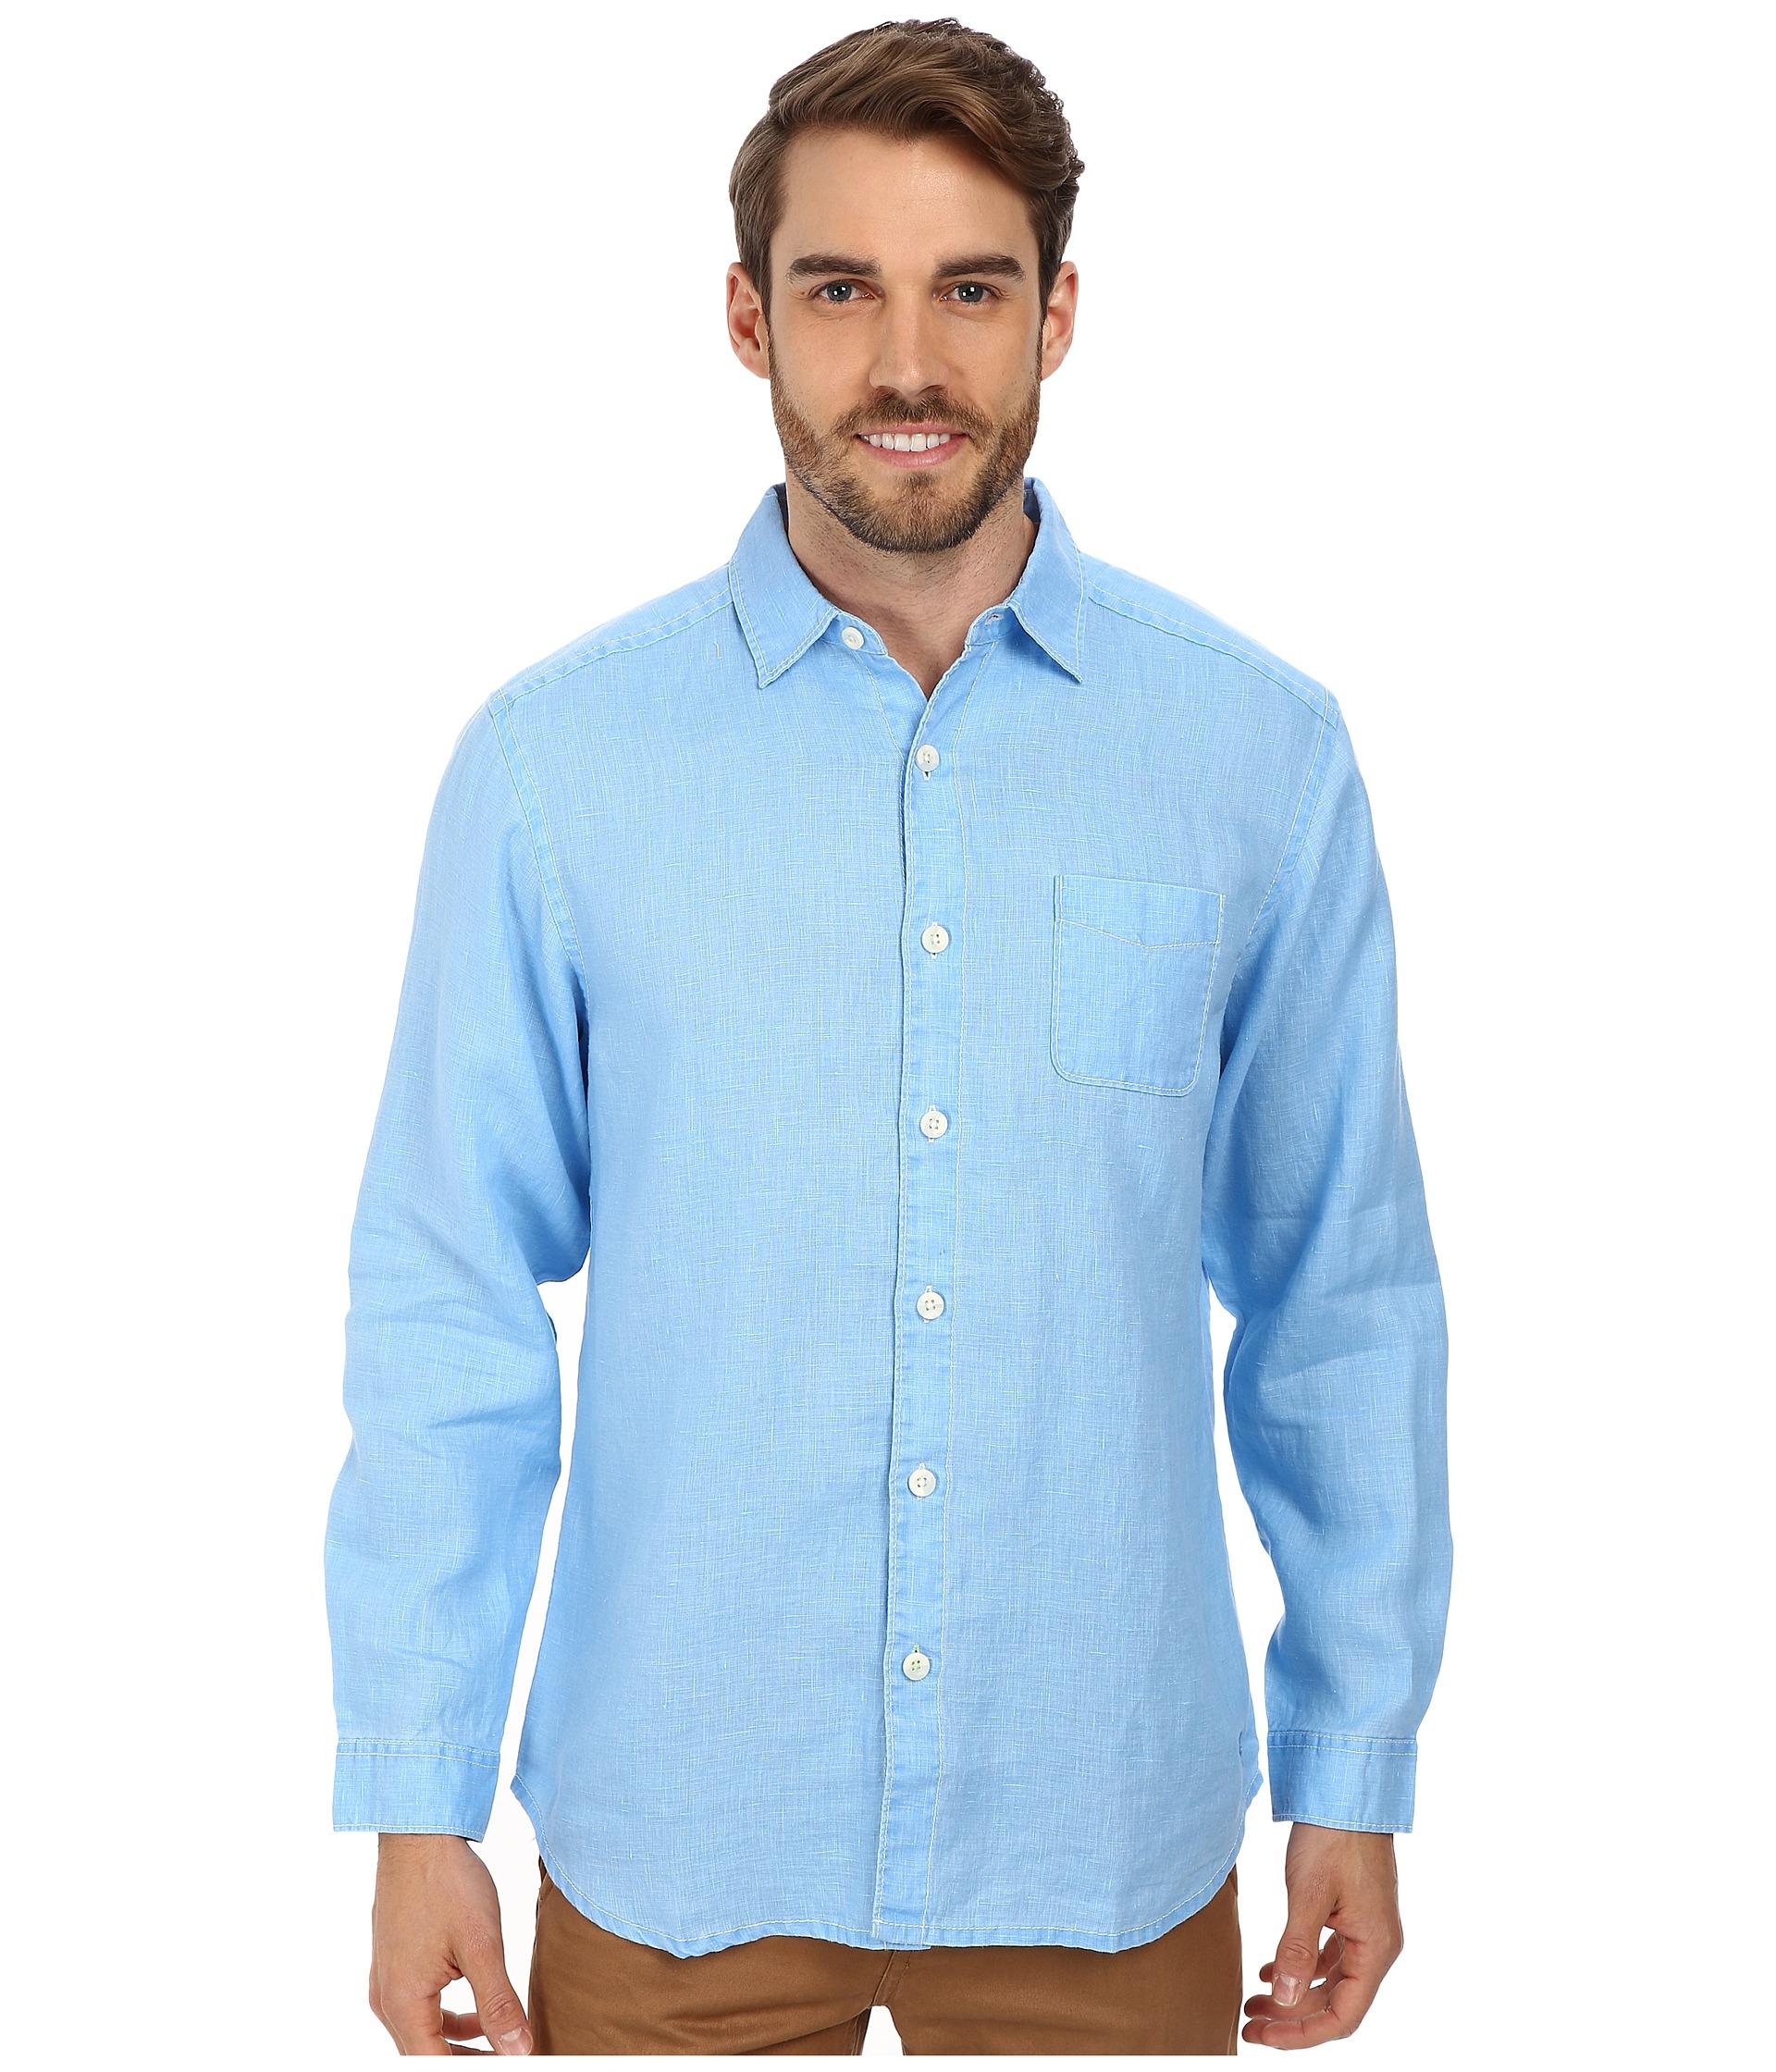 Tommy Bahama Sea Glass Breezer Long Sleeve Shirt At Zappos.com